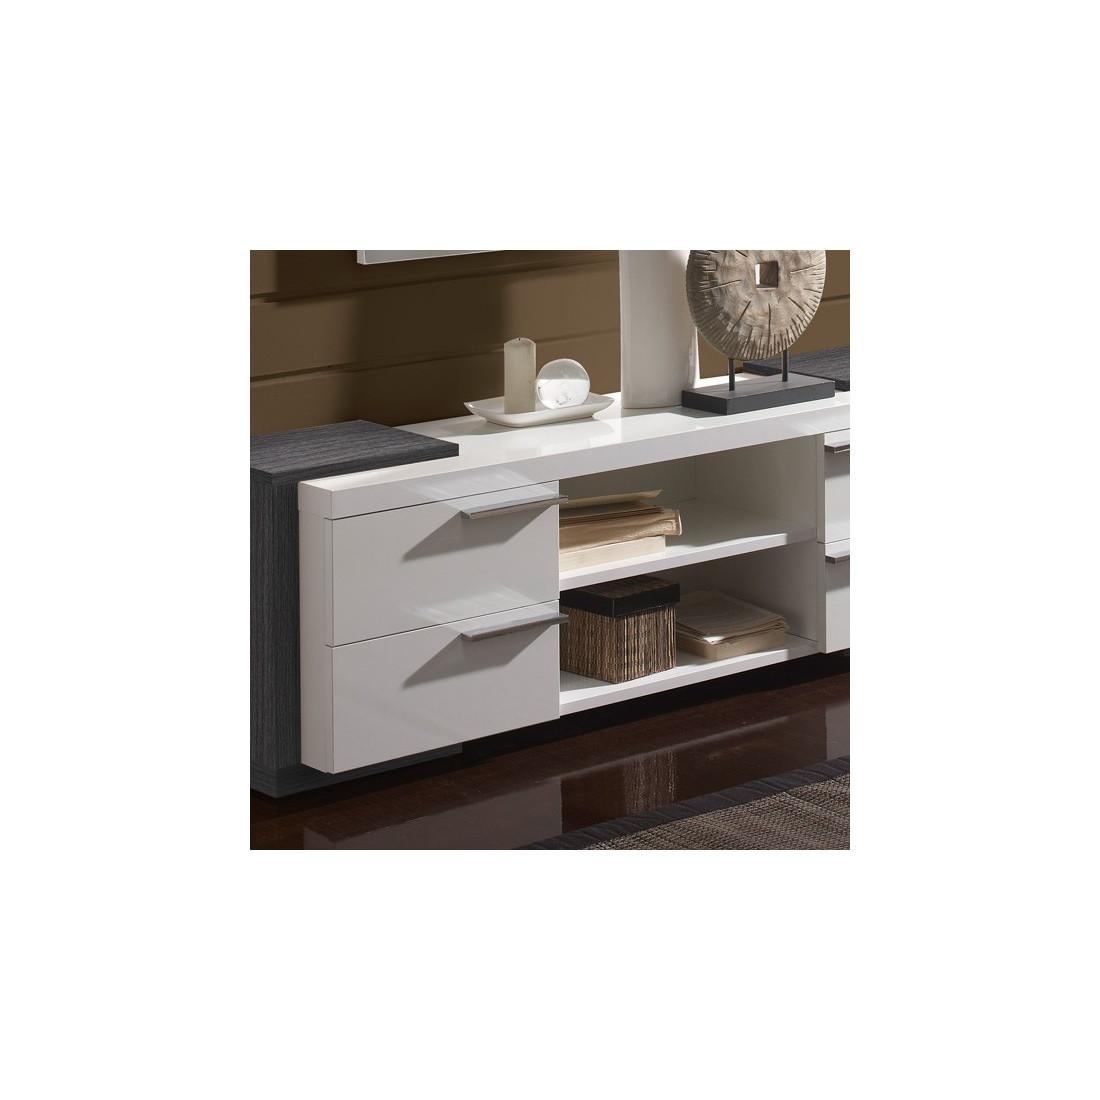 meuble d 39 entr e blanc cendre miroirs nave univers petits meubles. Black Bedroom Furniture Sets. Home Design Ideas